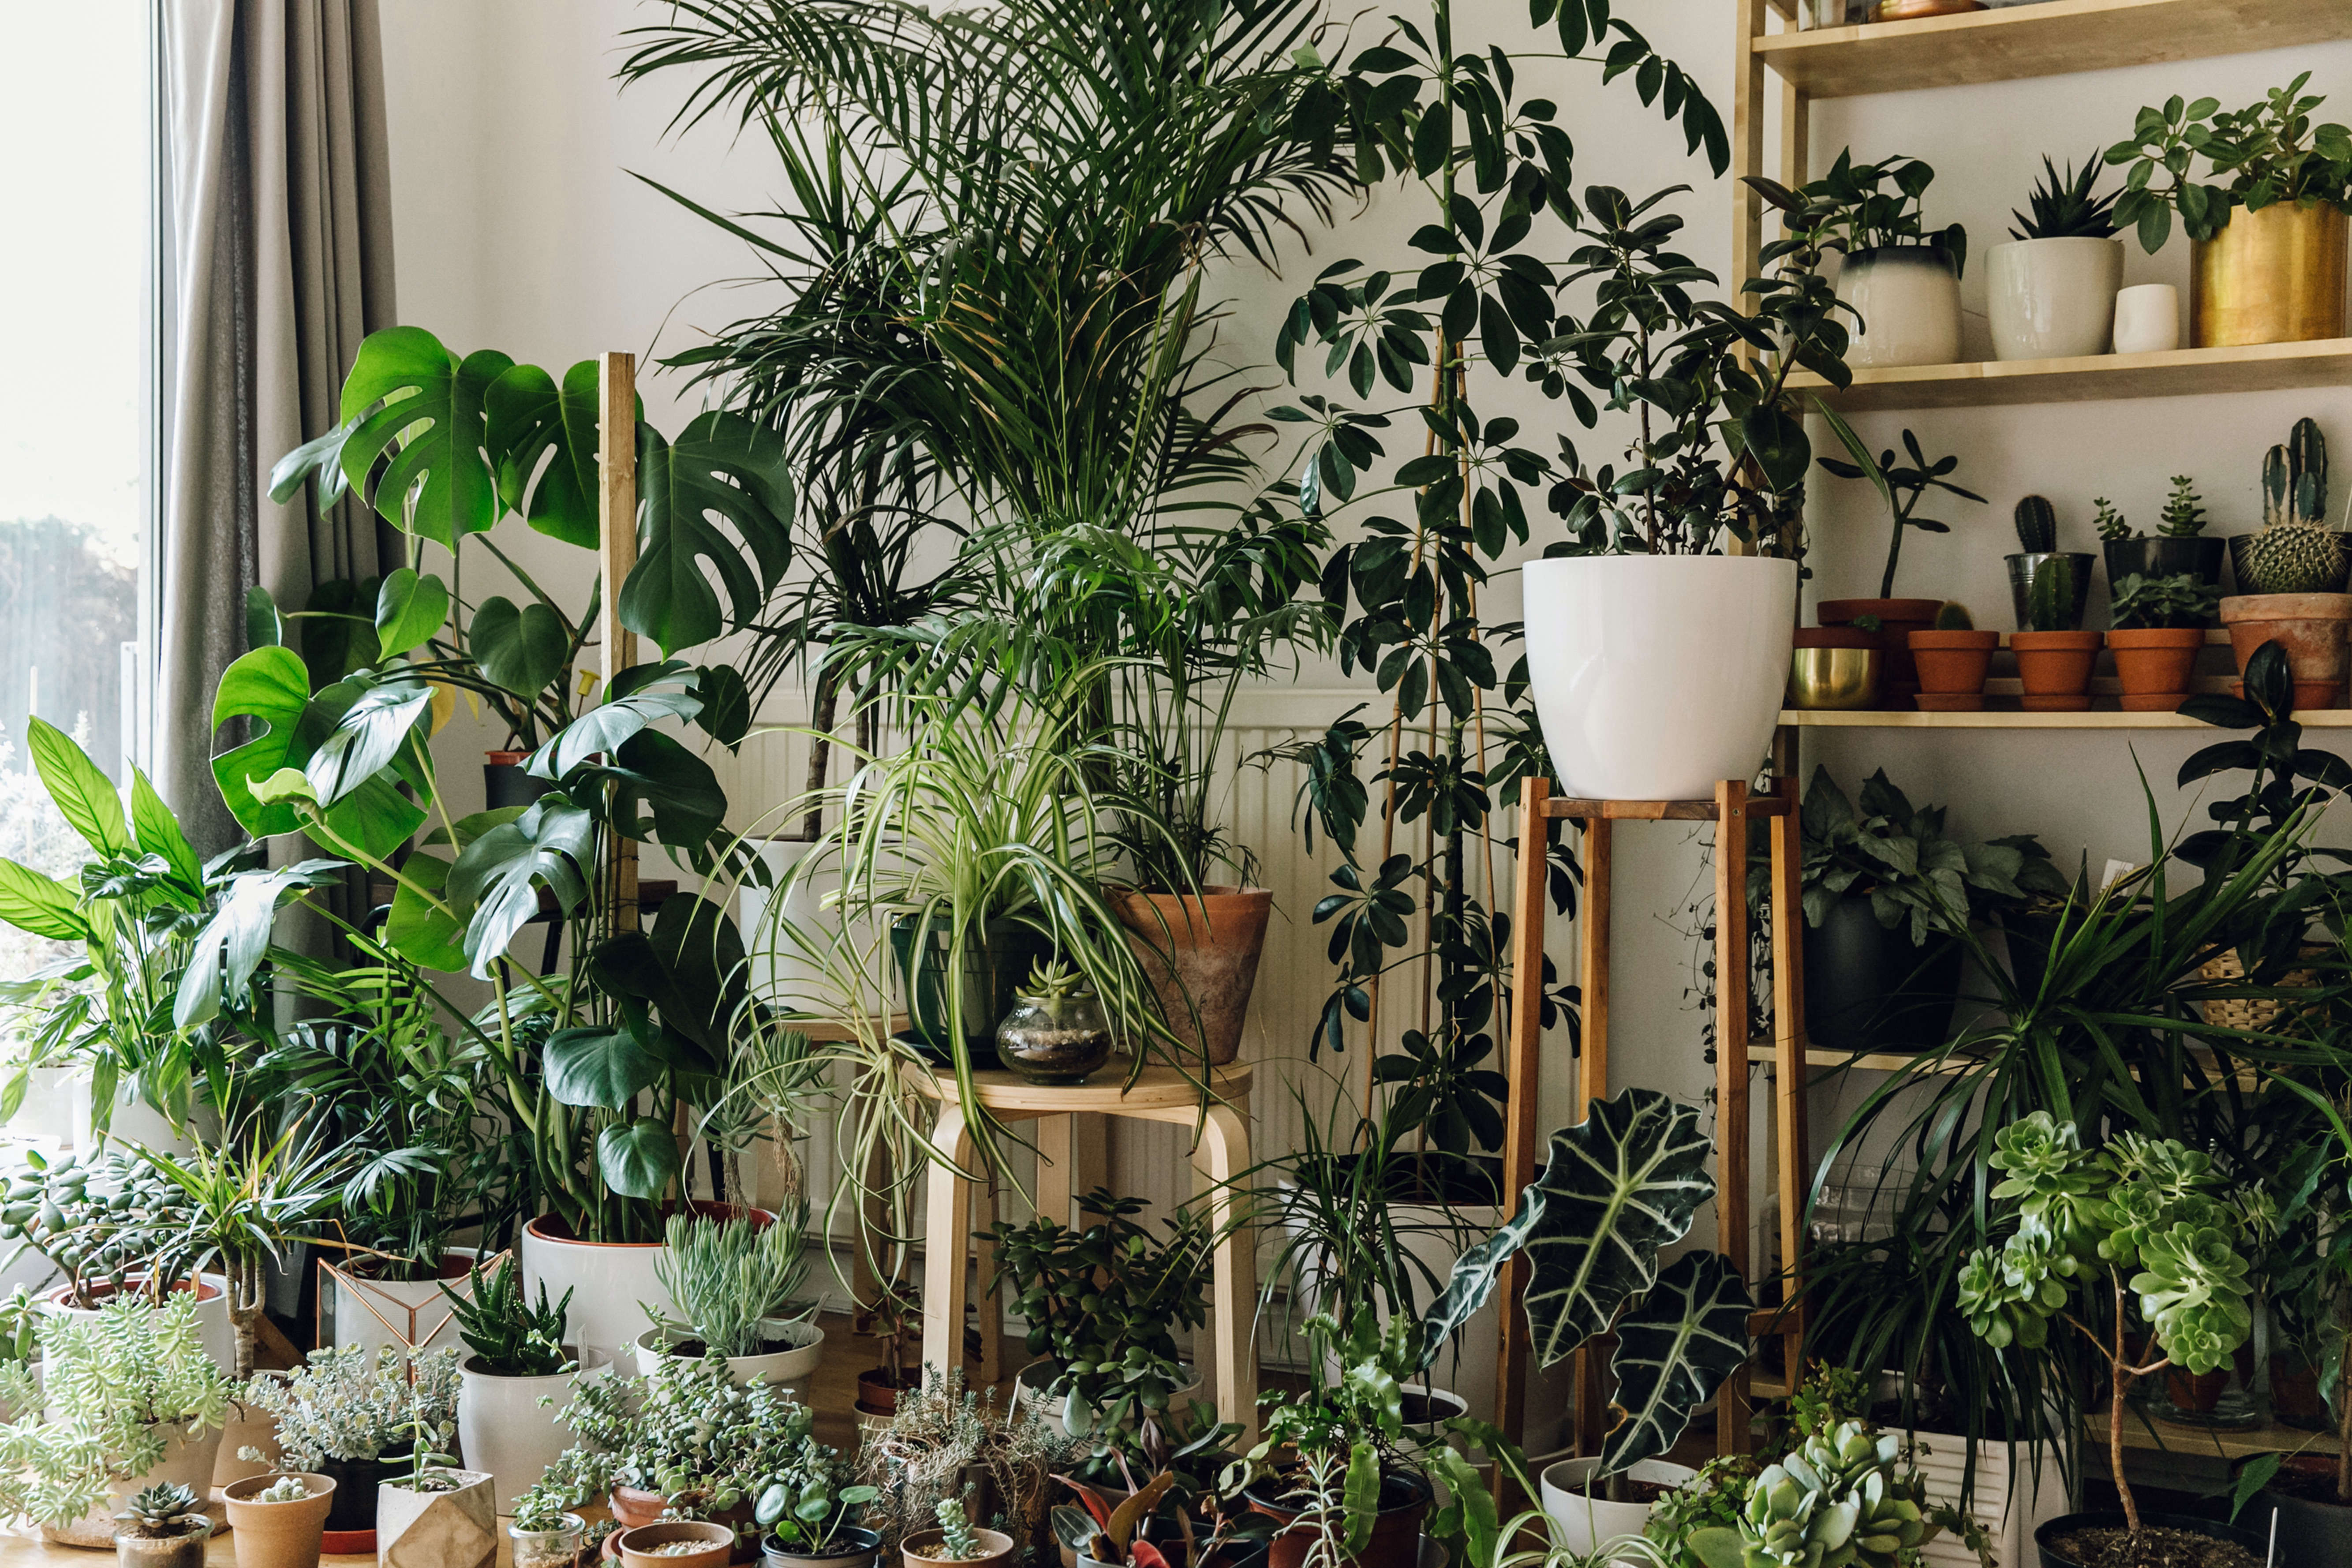 Evergreen Book Harken Plants on Shelves